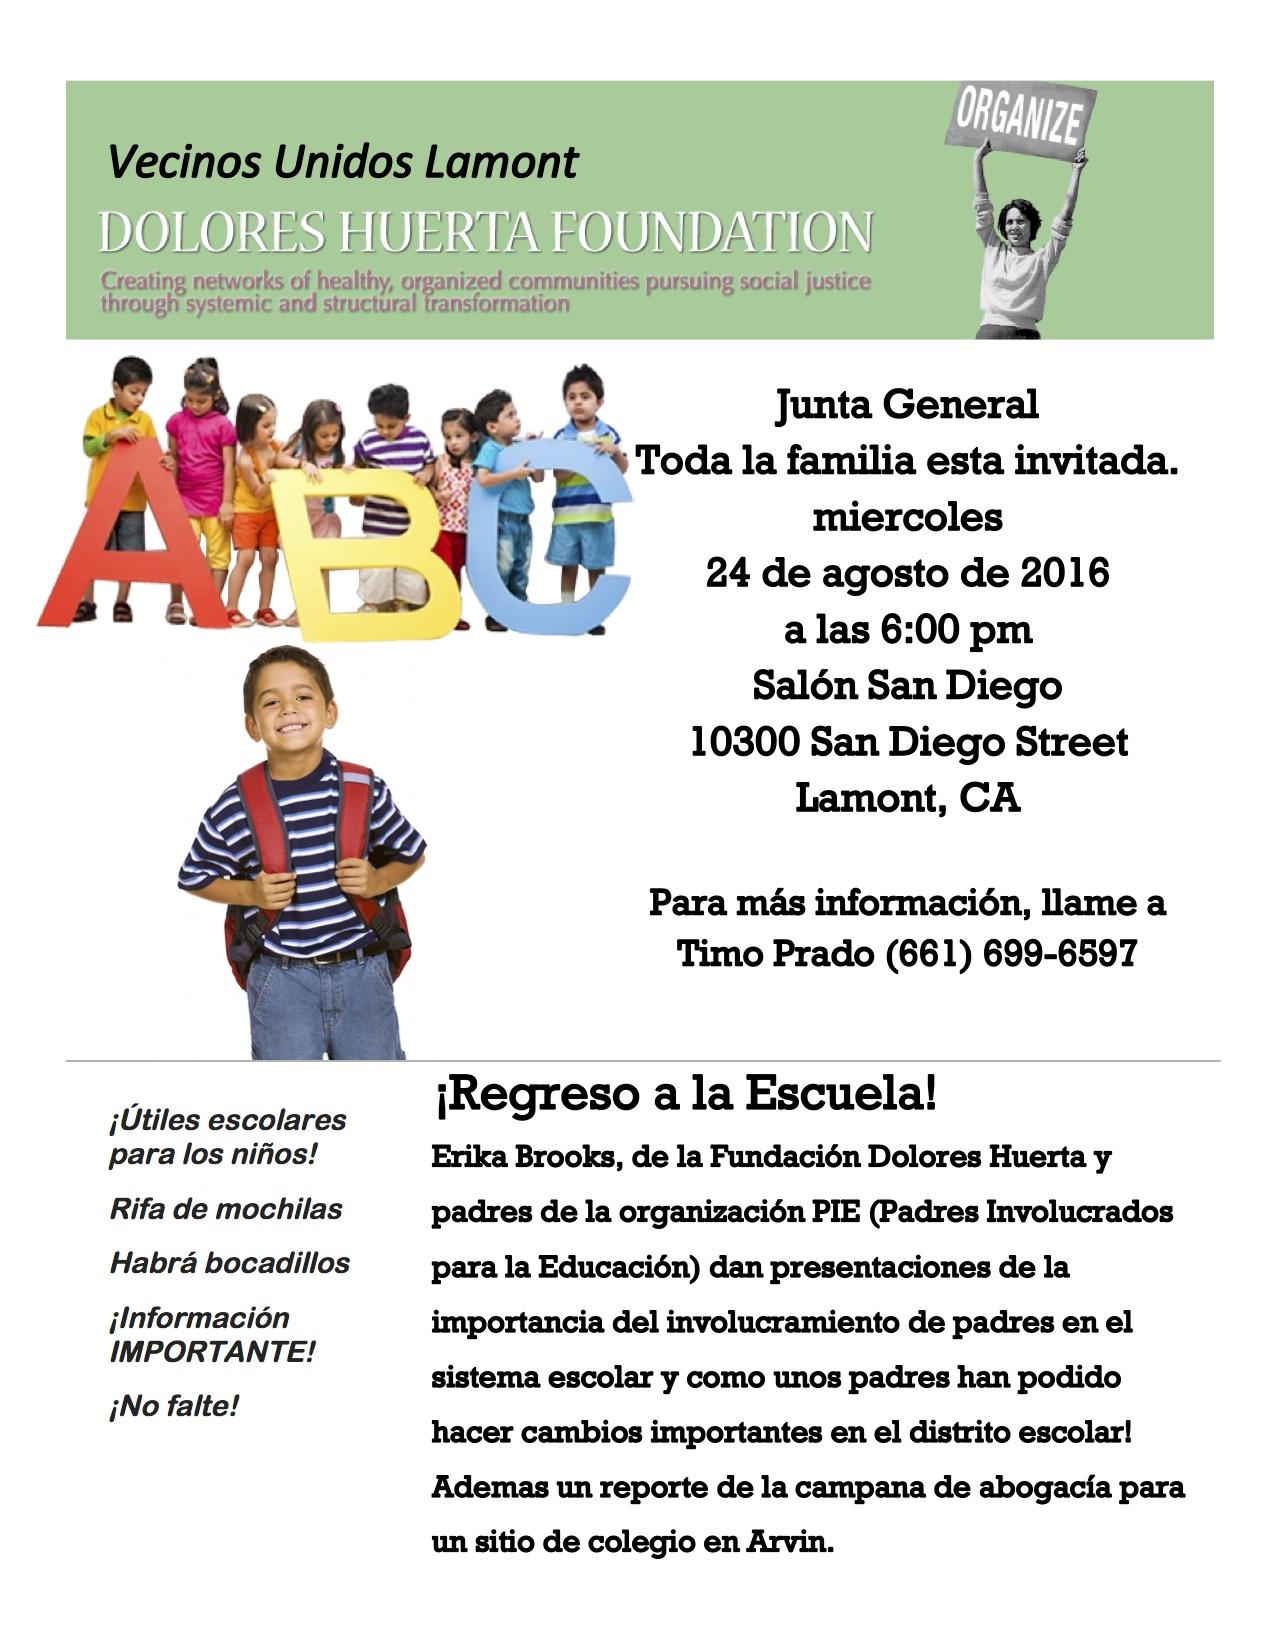 Lamont General Meeting Flyer 8-24-16